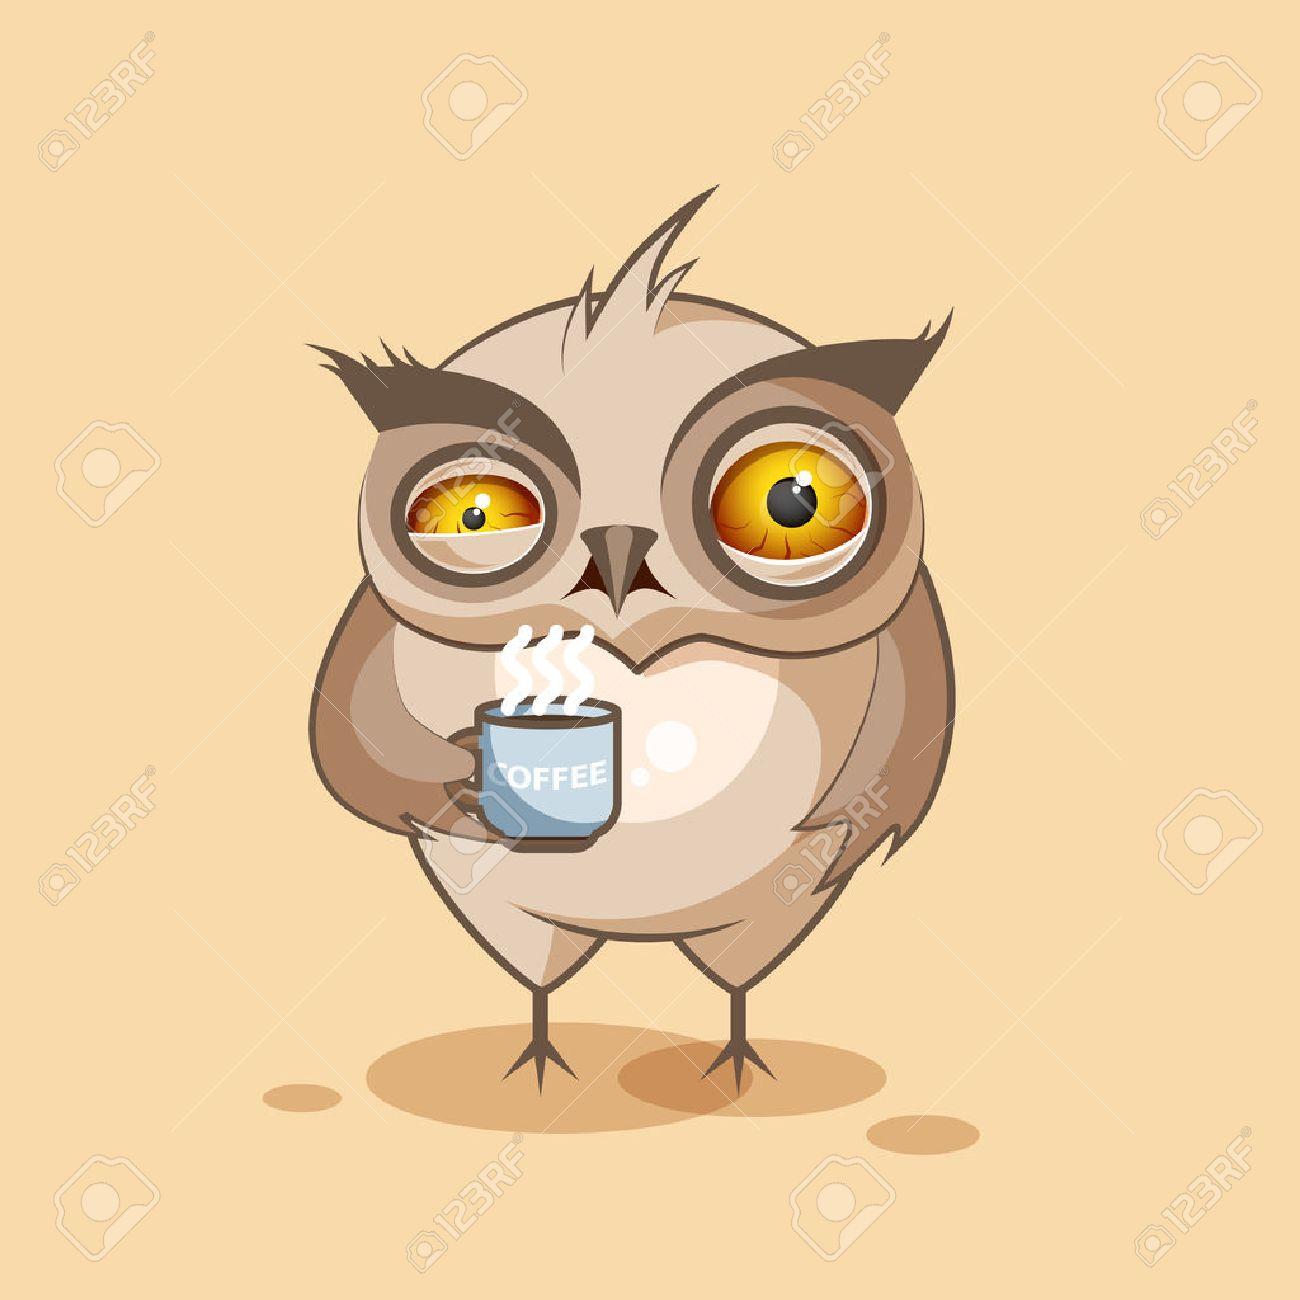 banque dimages vector illustration isol emoji dessin anim hibou nerveux avec tasse de caf autocollant moticne pour le site infographies vido - Dessin Avec Emoji